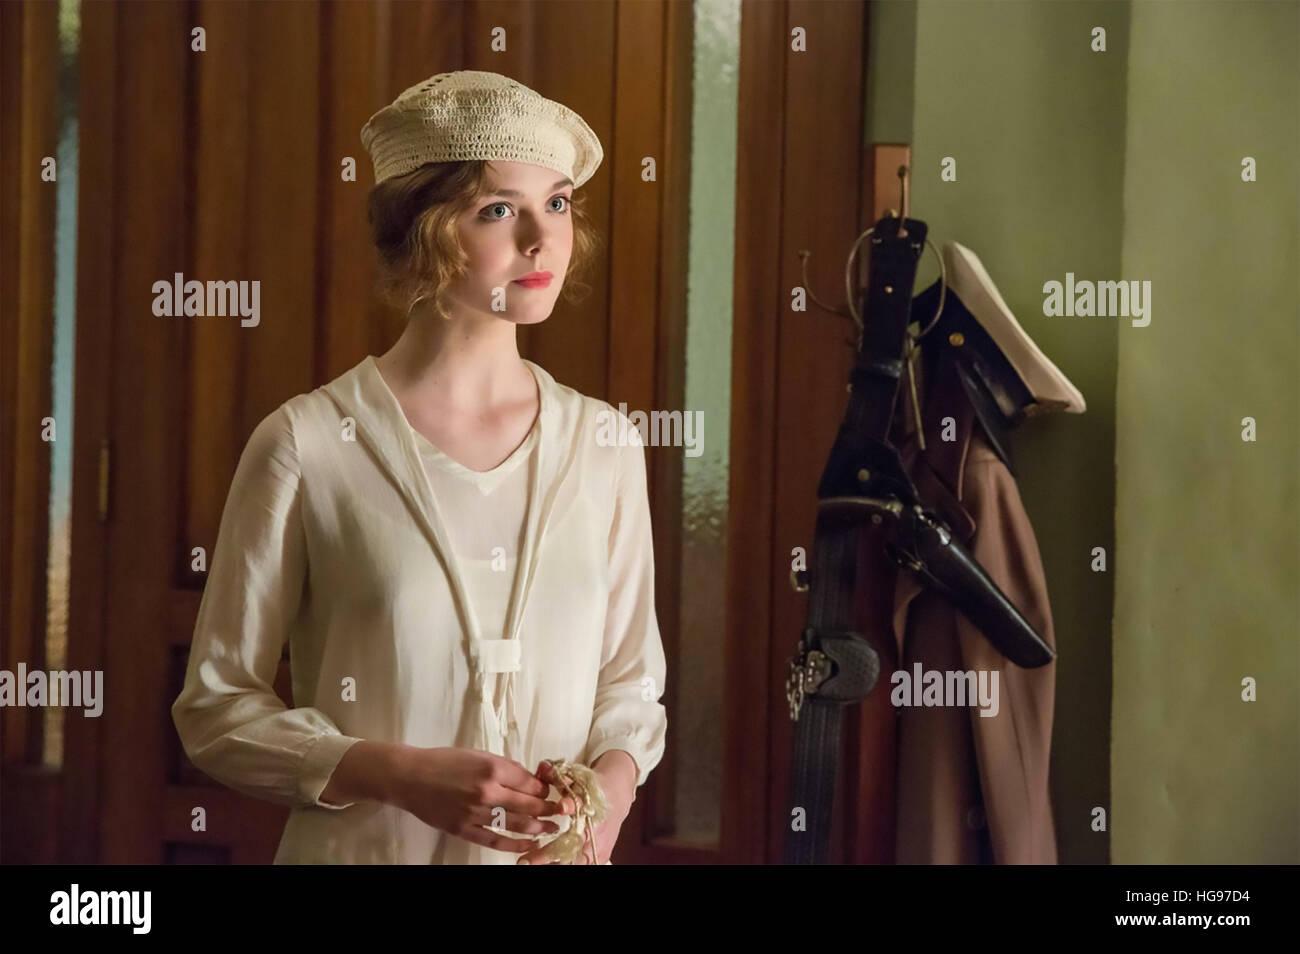 LIVE BY NIGHT 2016 Warner Bros Film mit Elle Fanning Stockbild